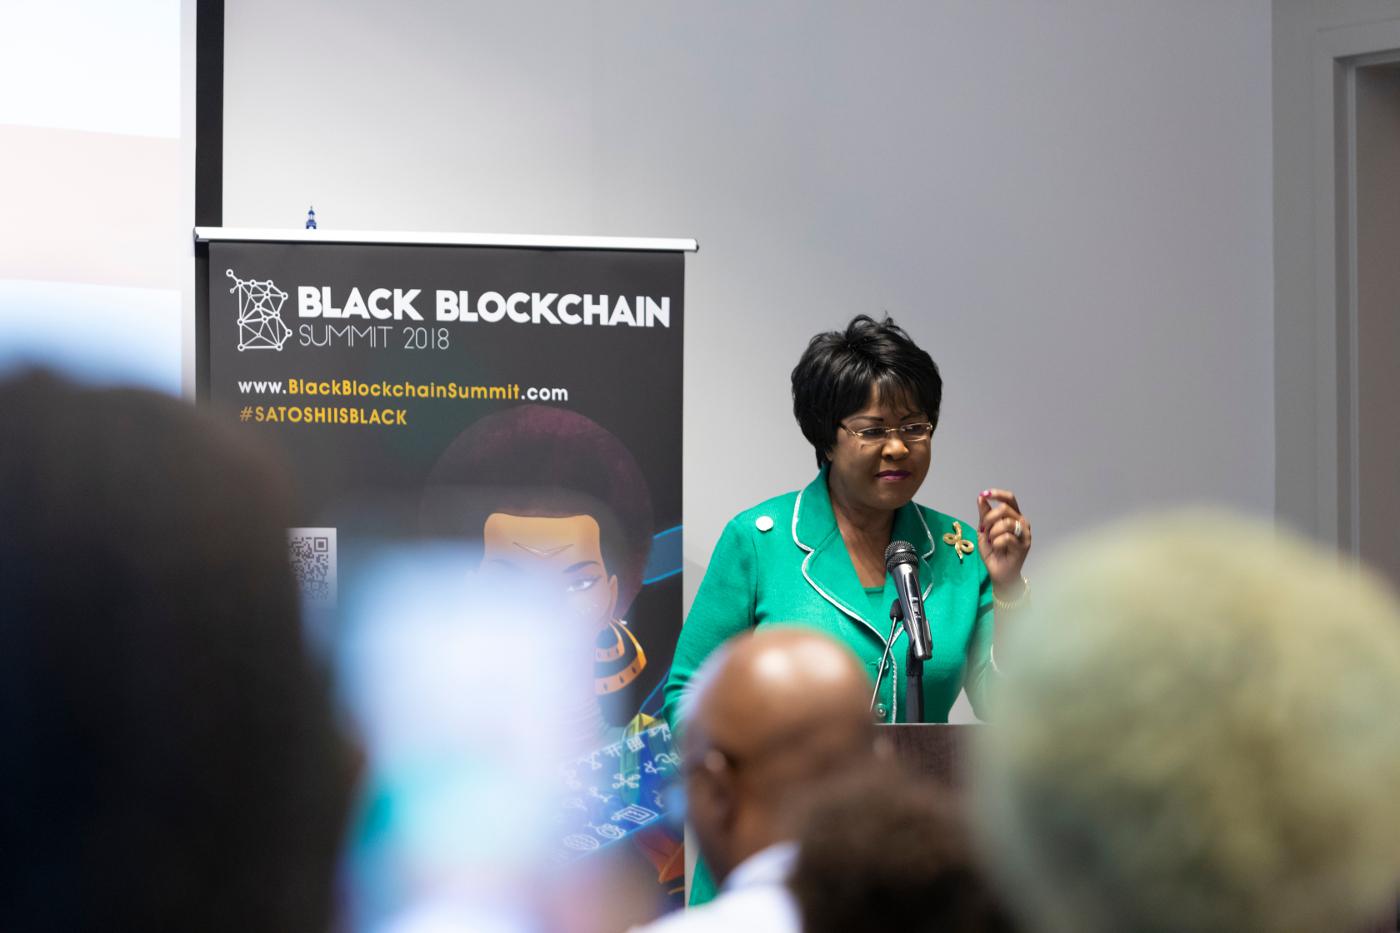 Black Blockchain Summit